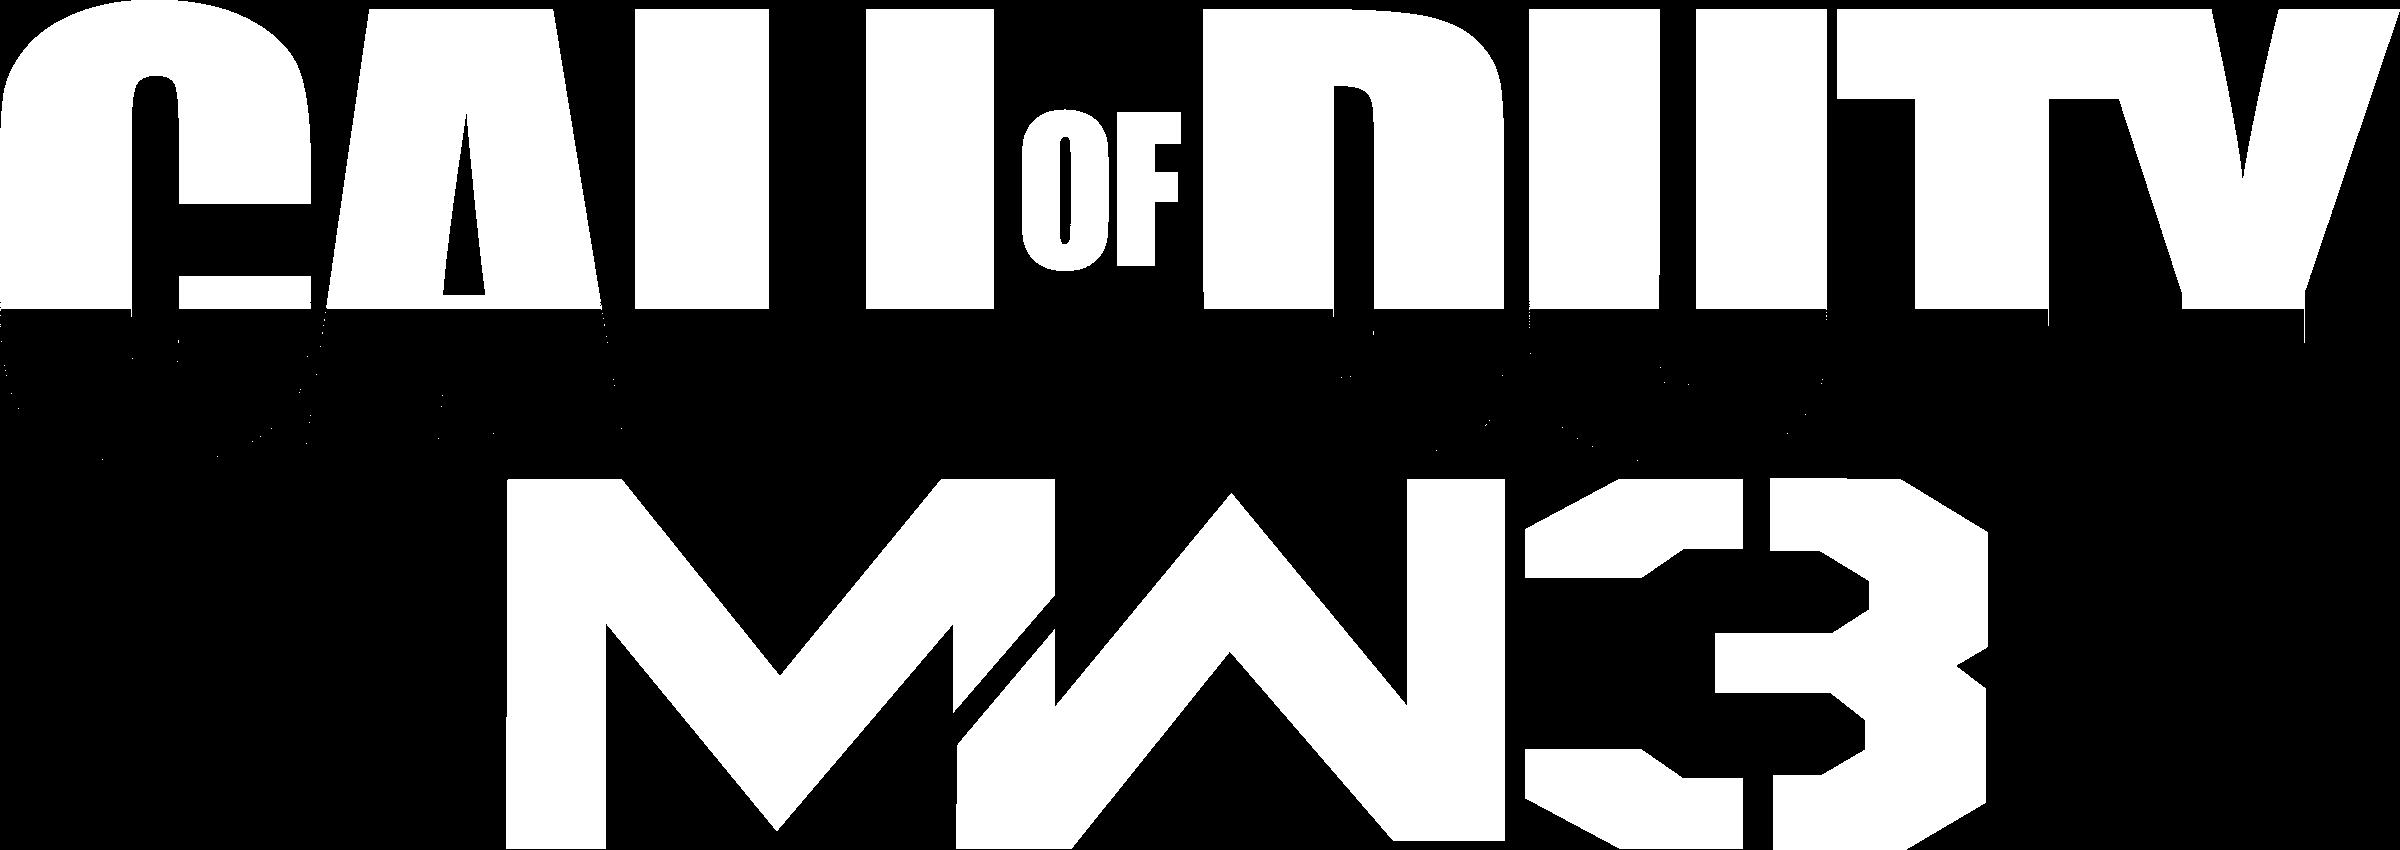 Call Of Duty Modern Warfare 3 Logo Png Transparent Svg Vector